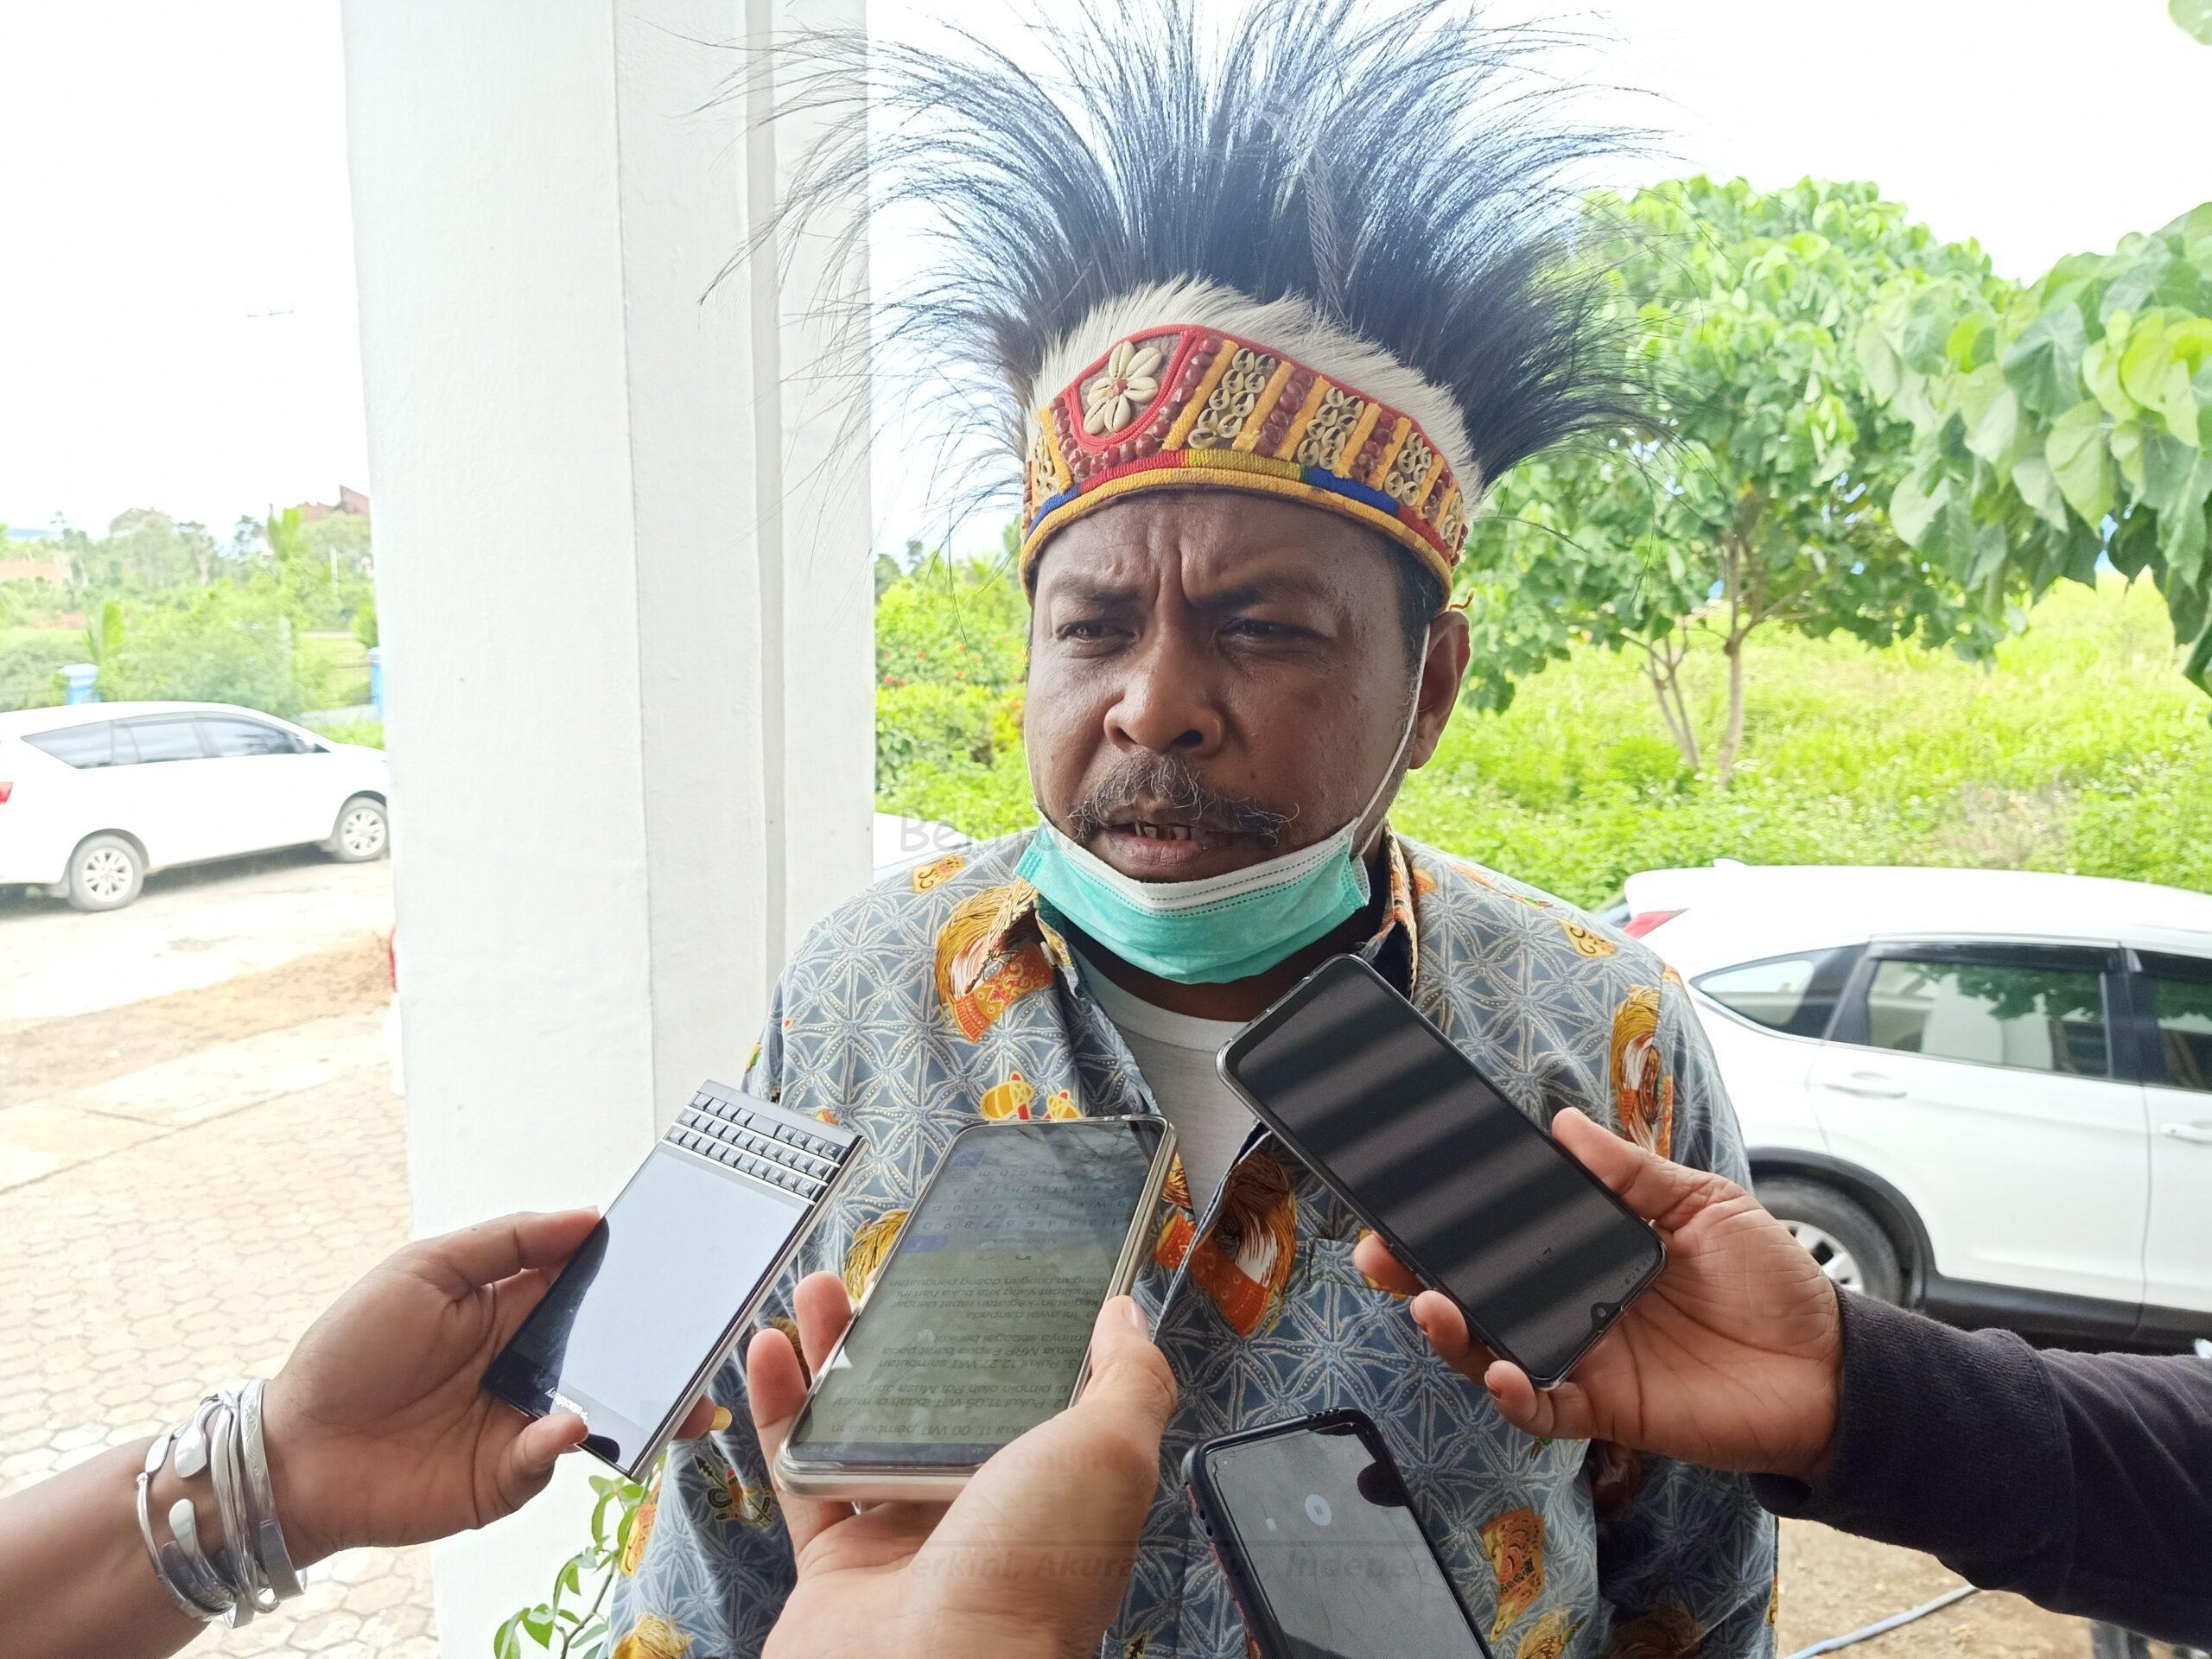 Ketua MRP PB: Data Pemohon Rekomendasi Bintara Otsus Membludak 12 IMG20200924124836 scaled